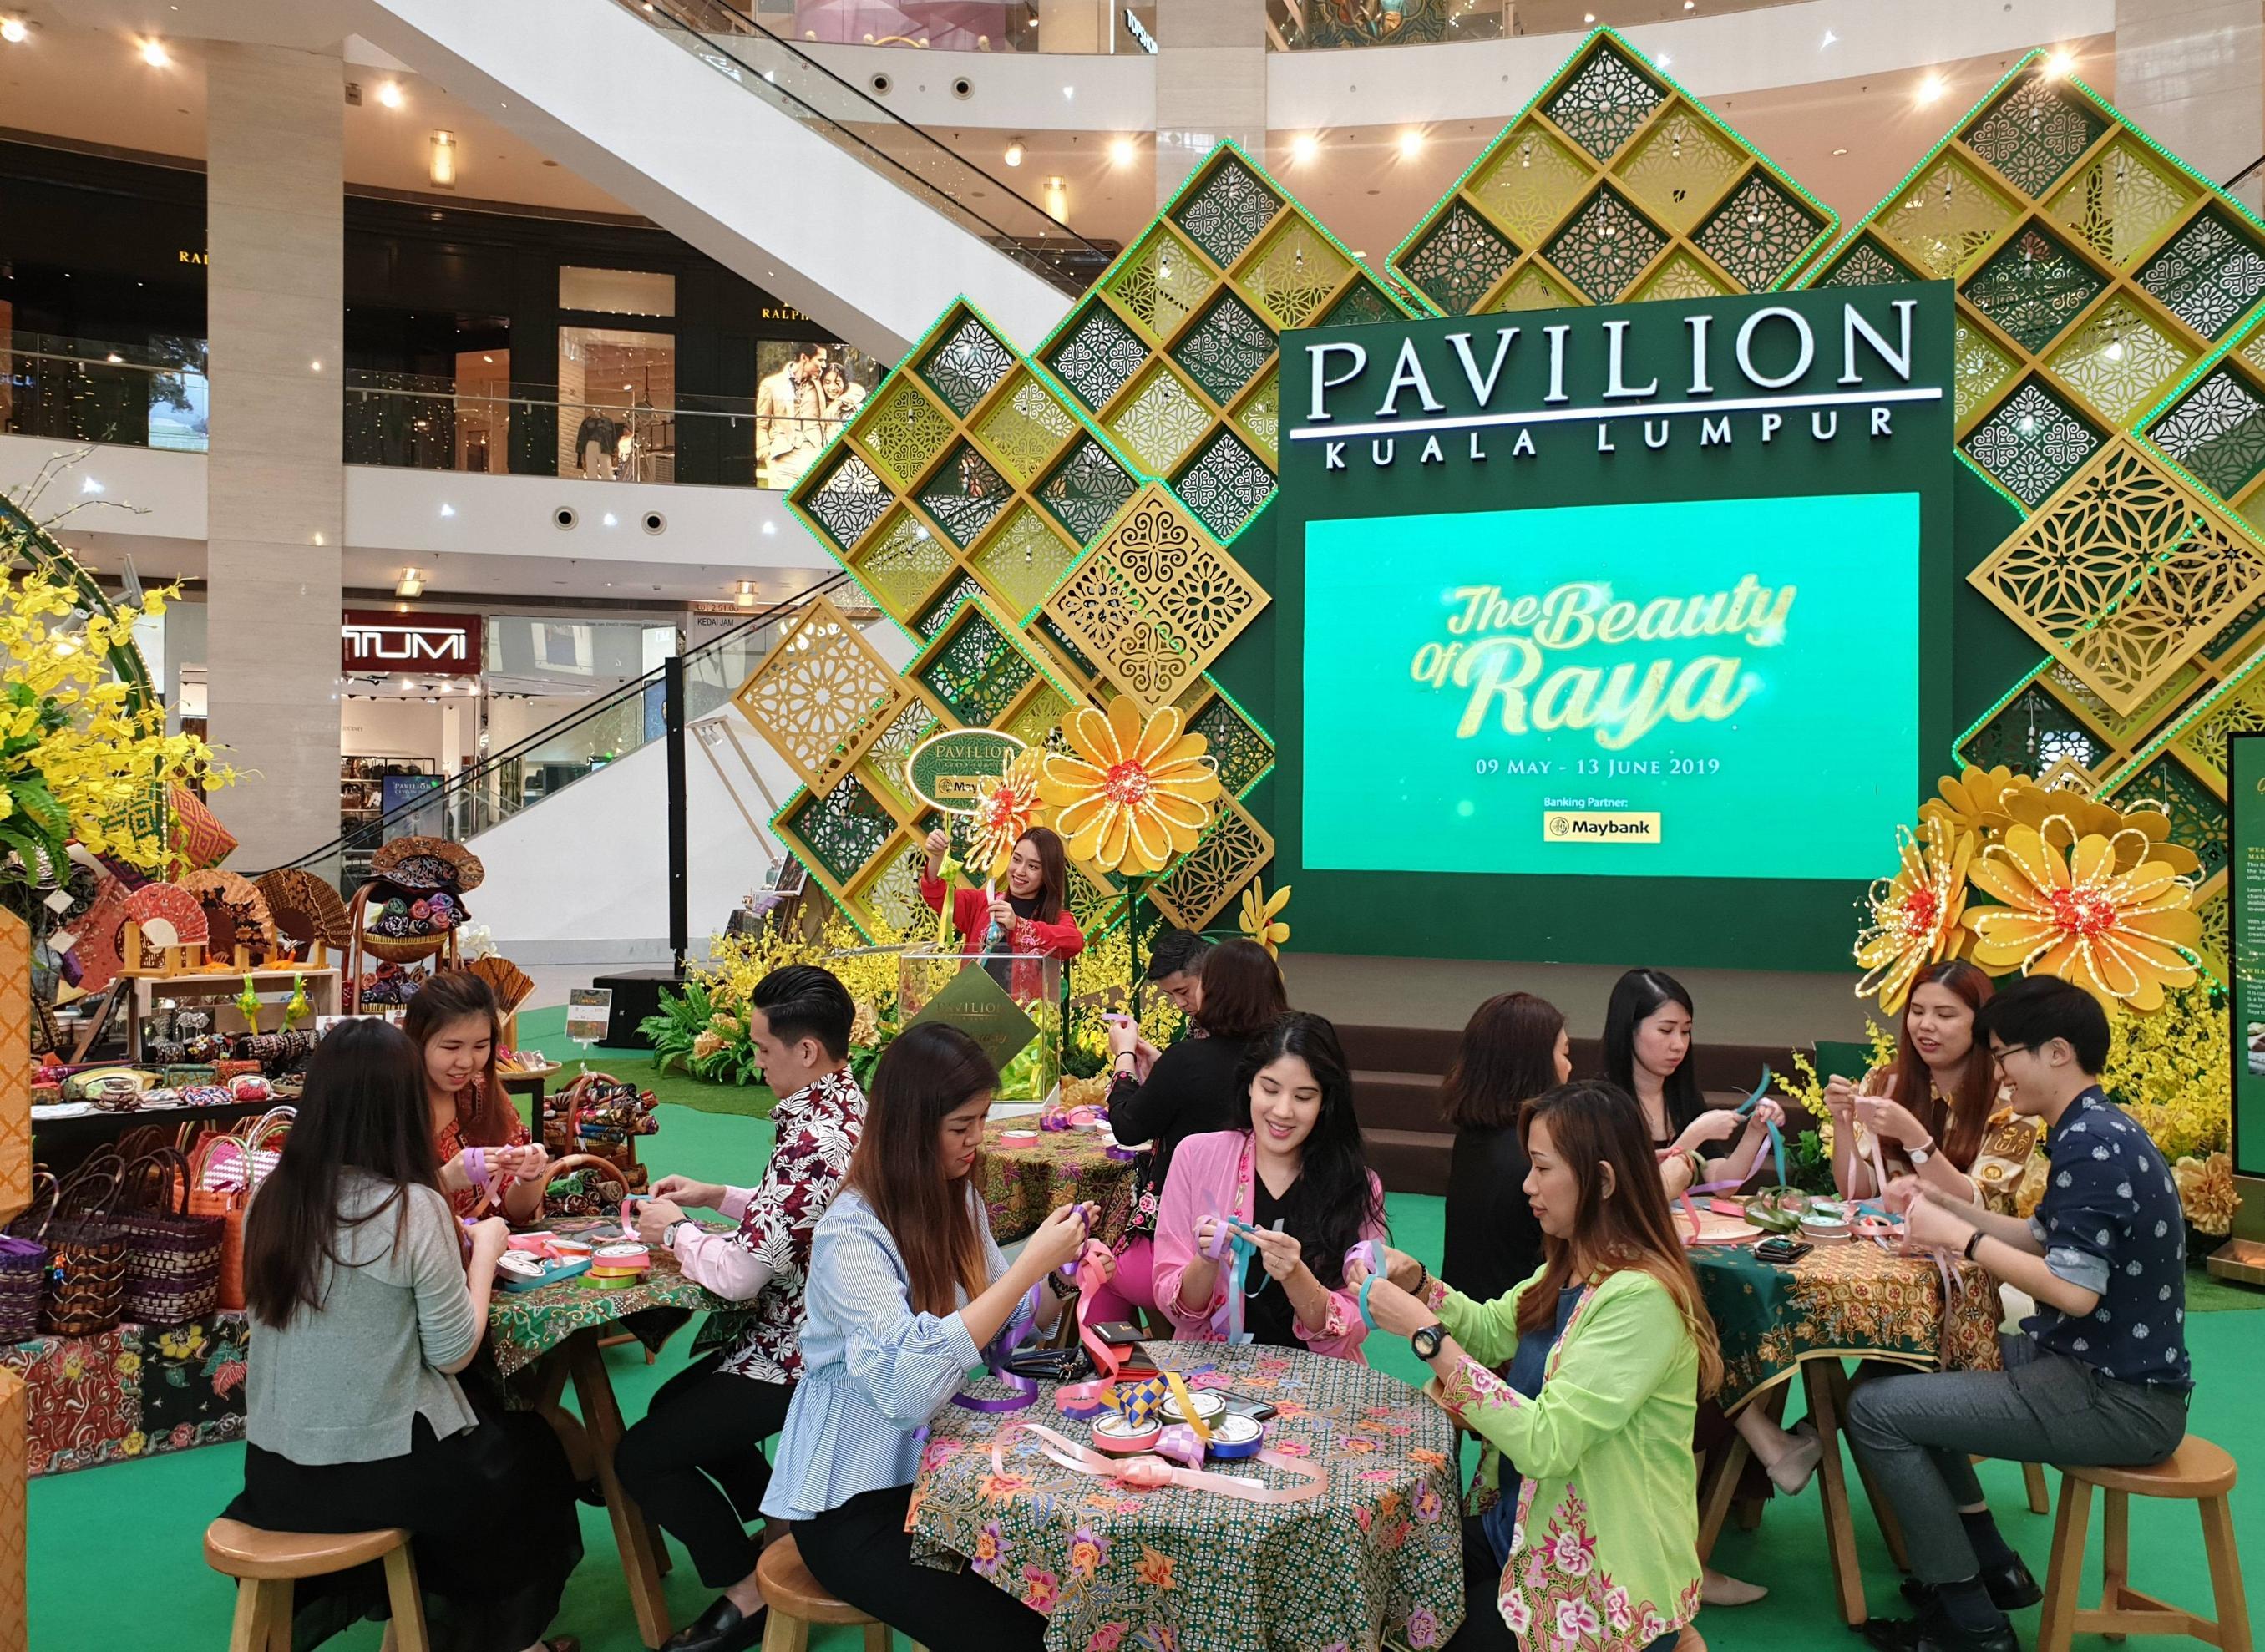 Image from Pavilion KL